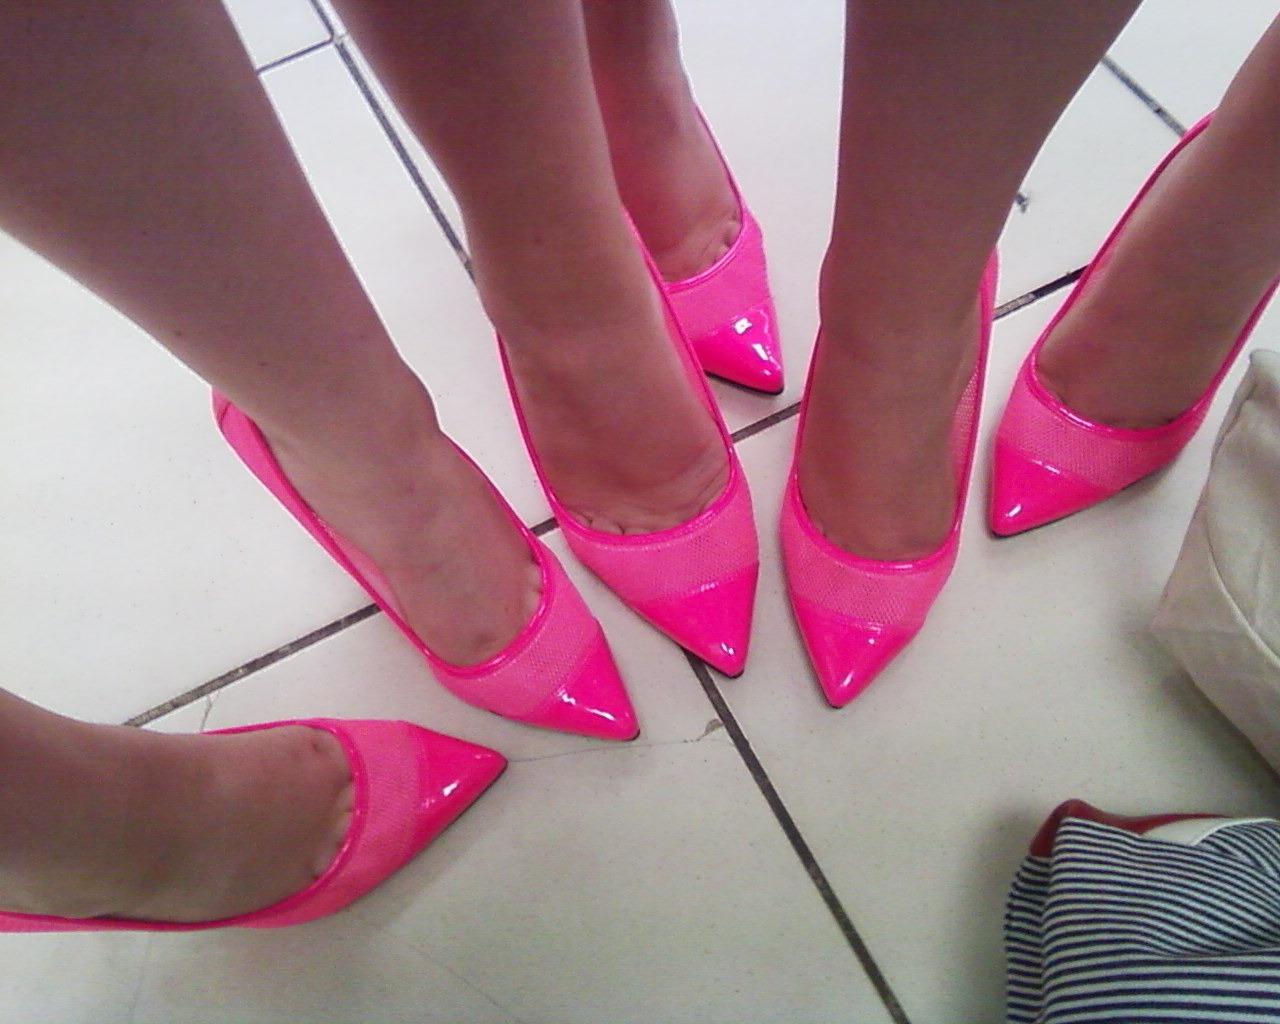 Free Images : hand, shoe, feet, female, leg, finger, fashion ...